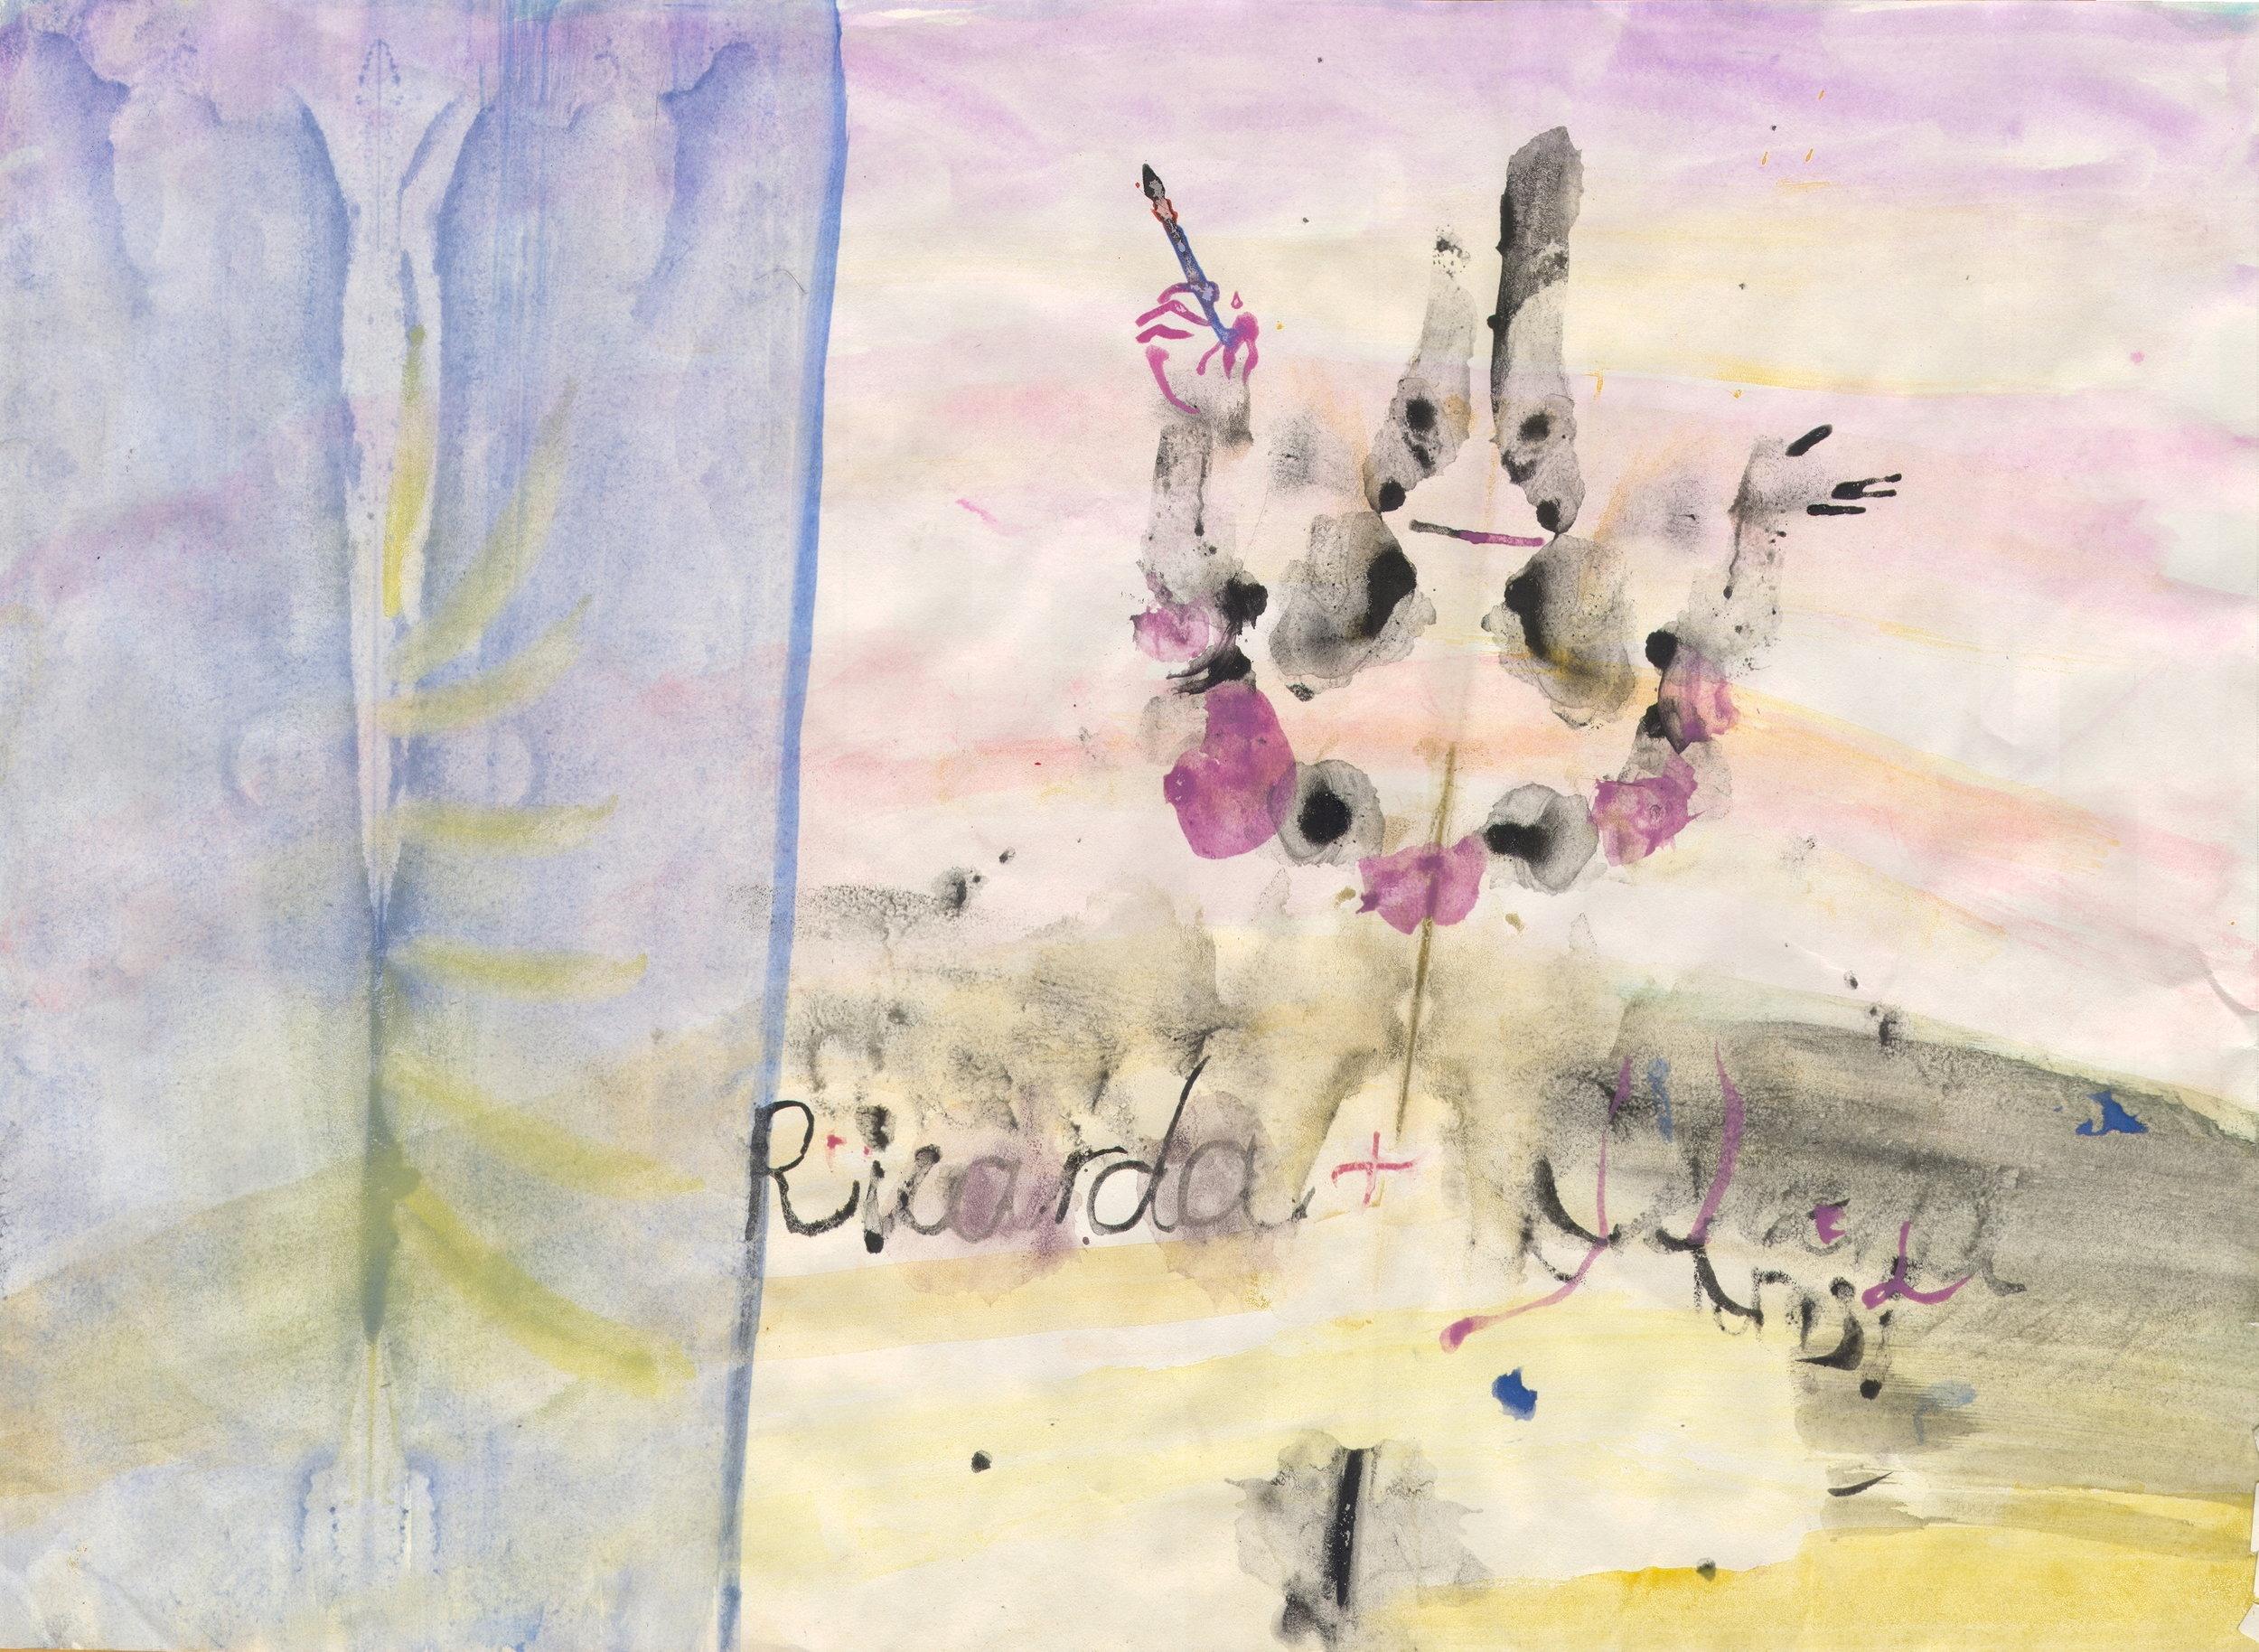 O.T. ( Ricarda ), 2018  Tempera Papier, 40.5x29.2cm